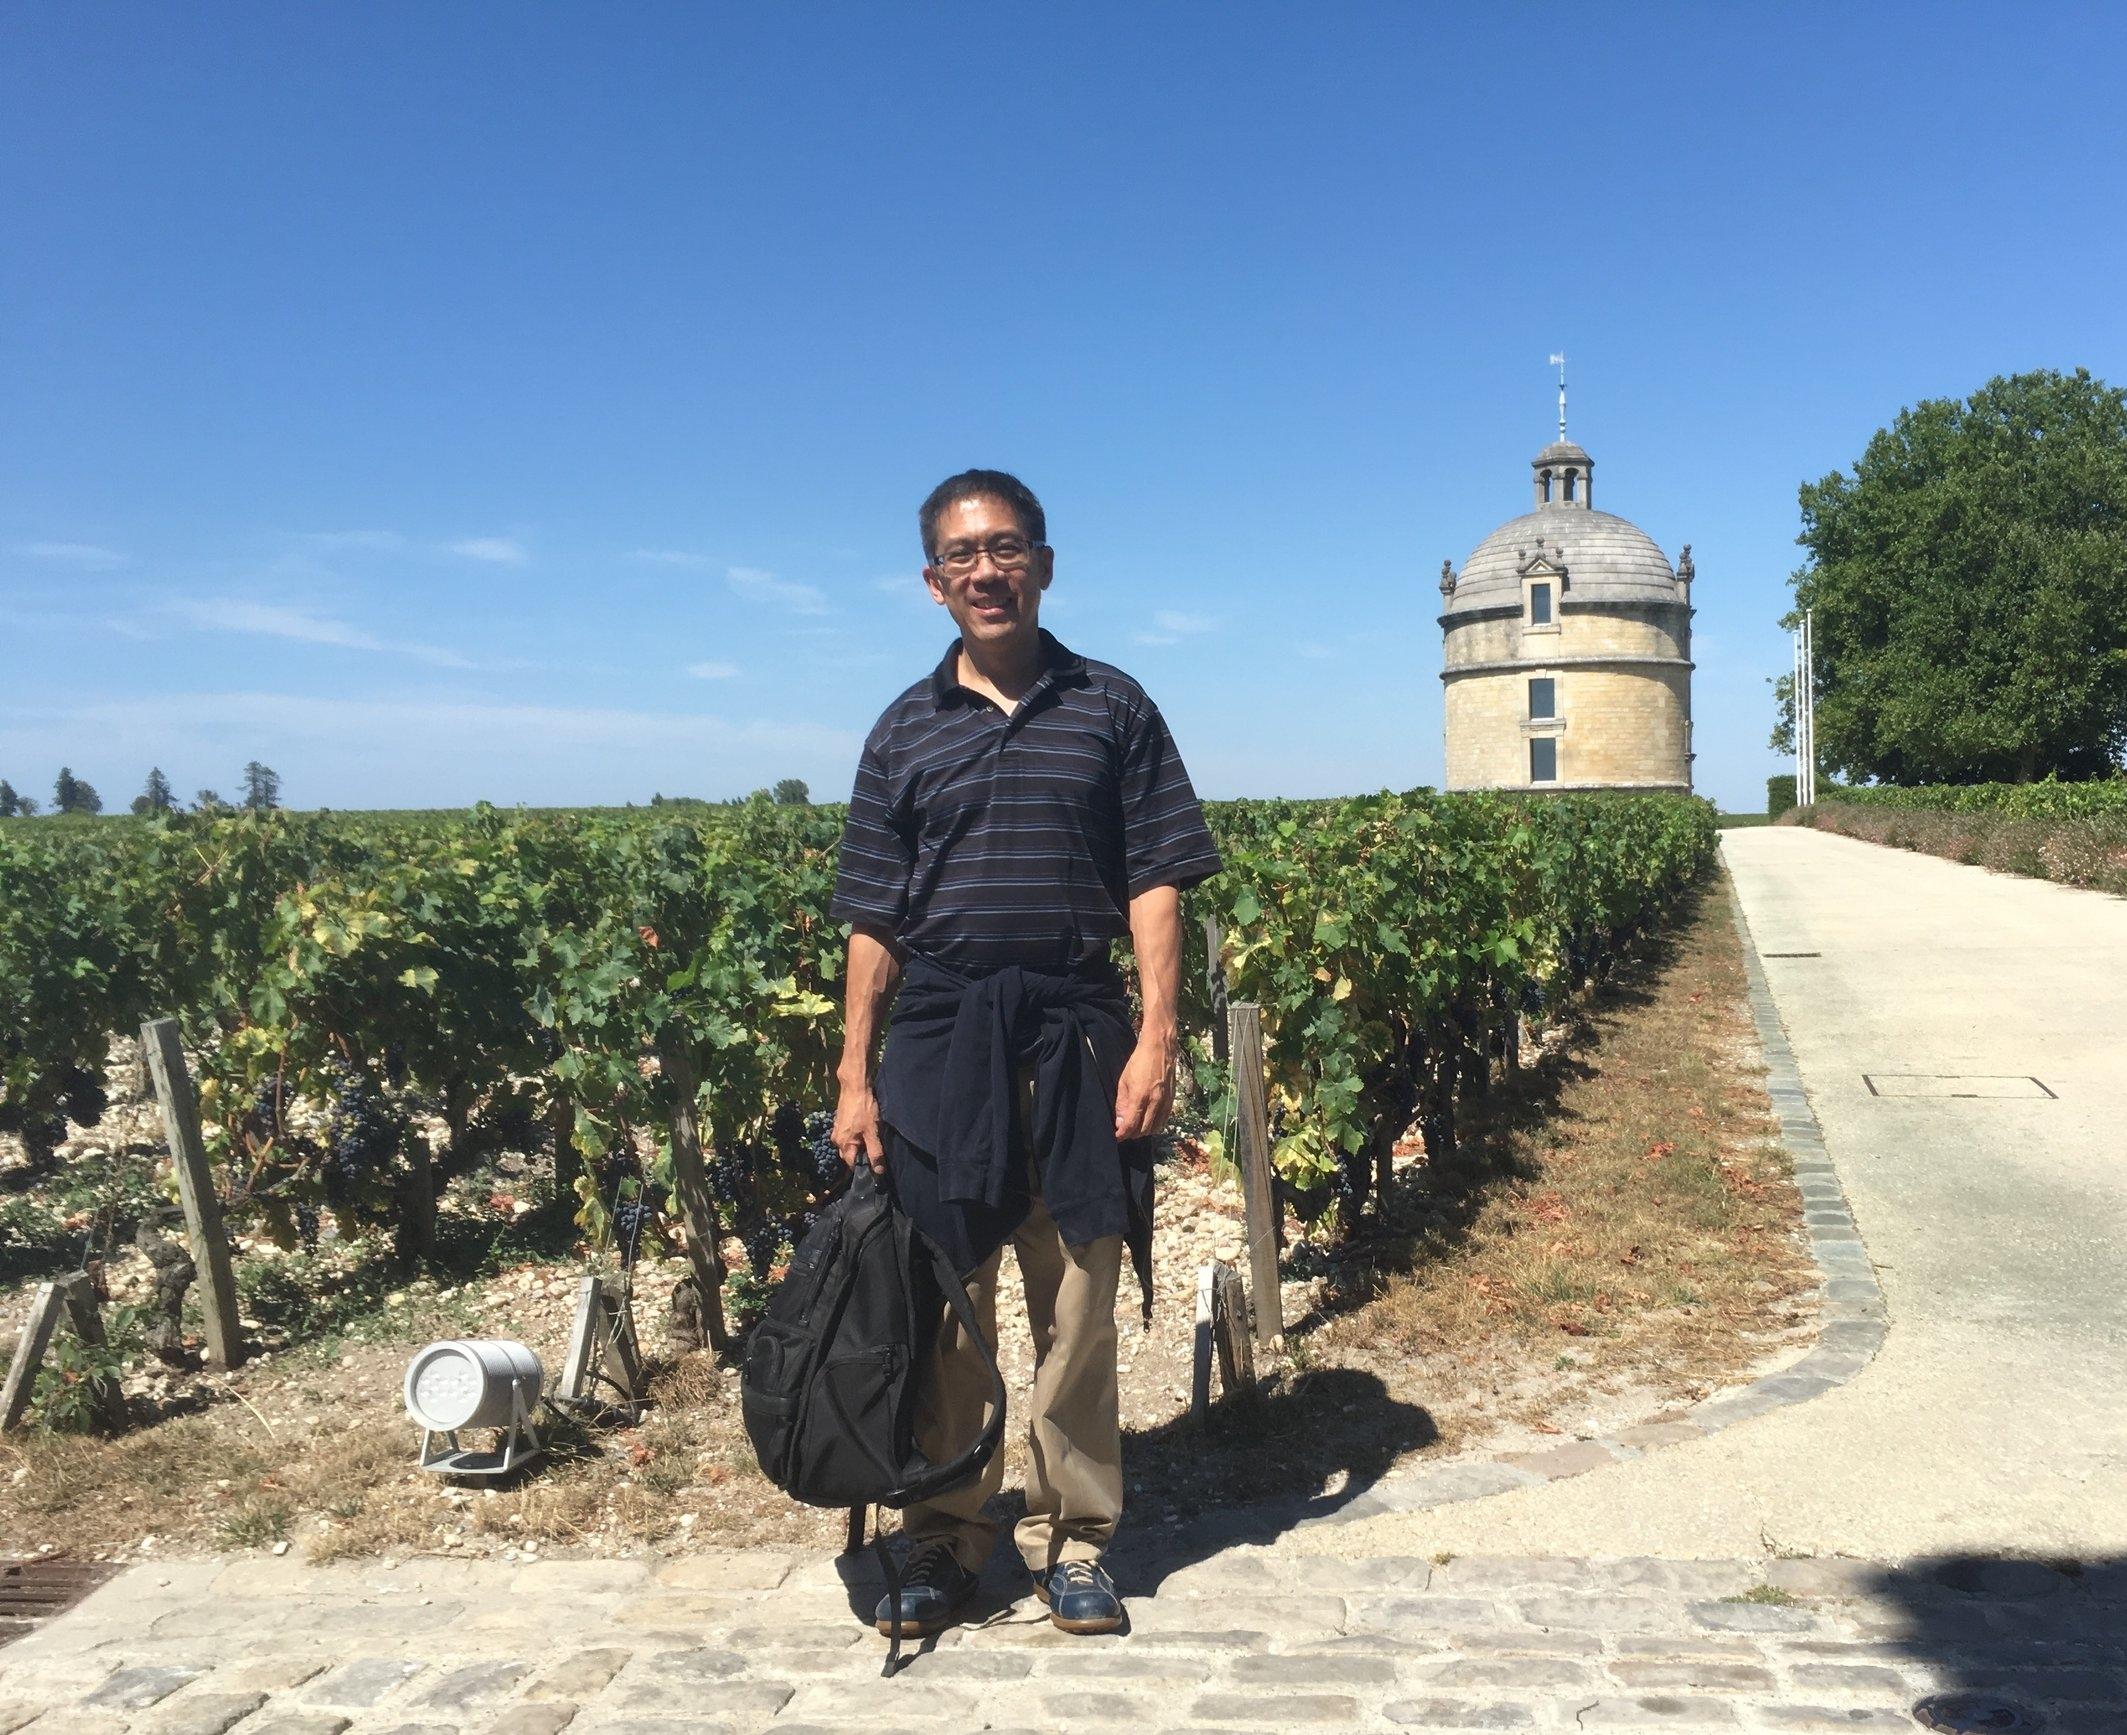 Andy at Chateau Latour.jpg